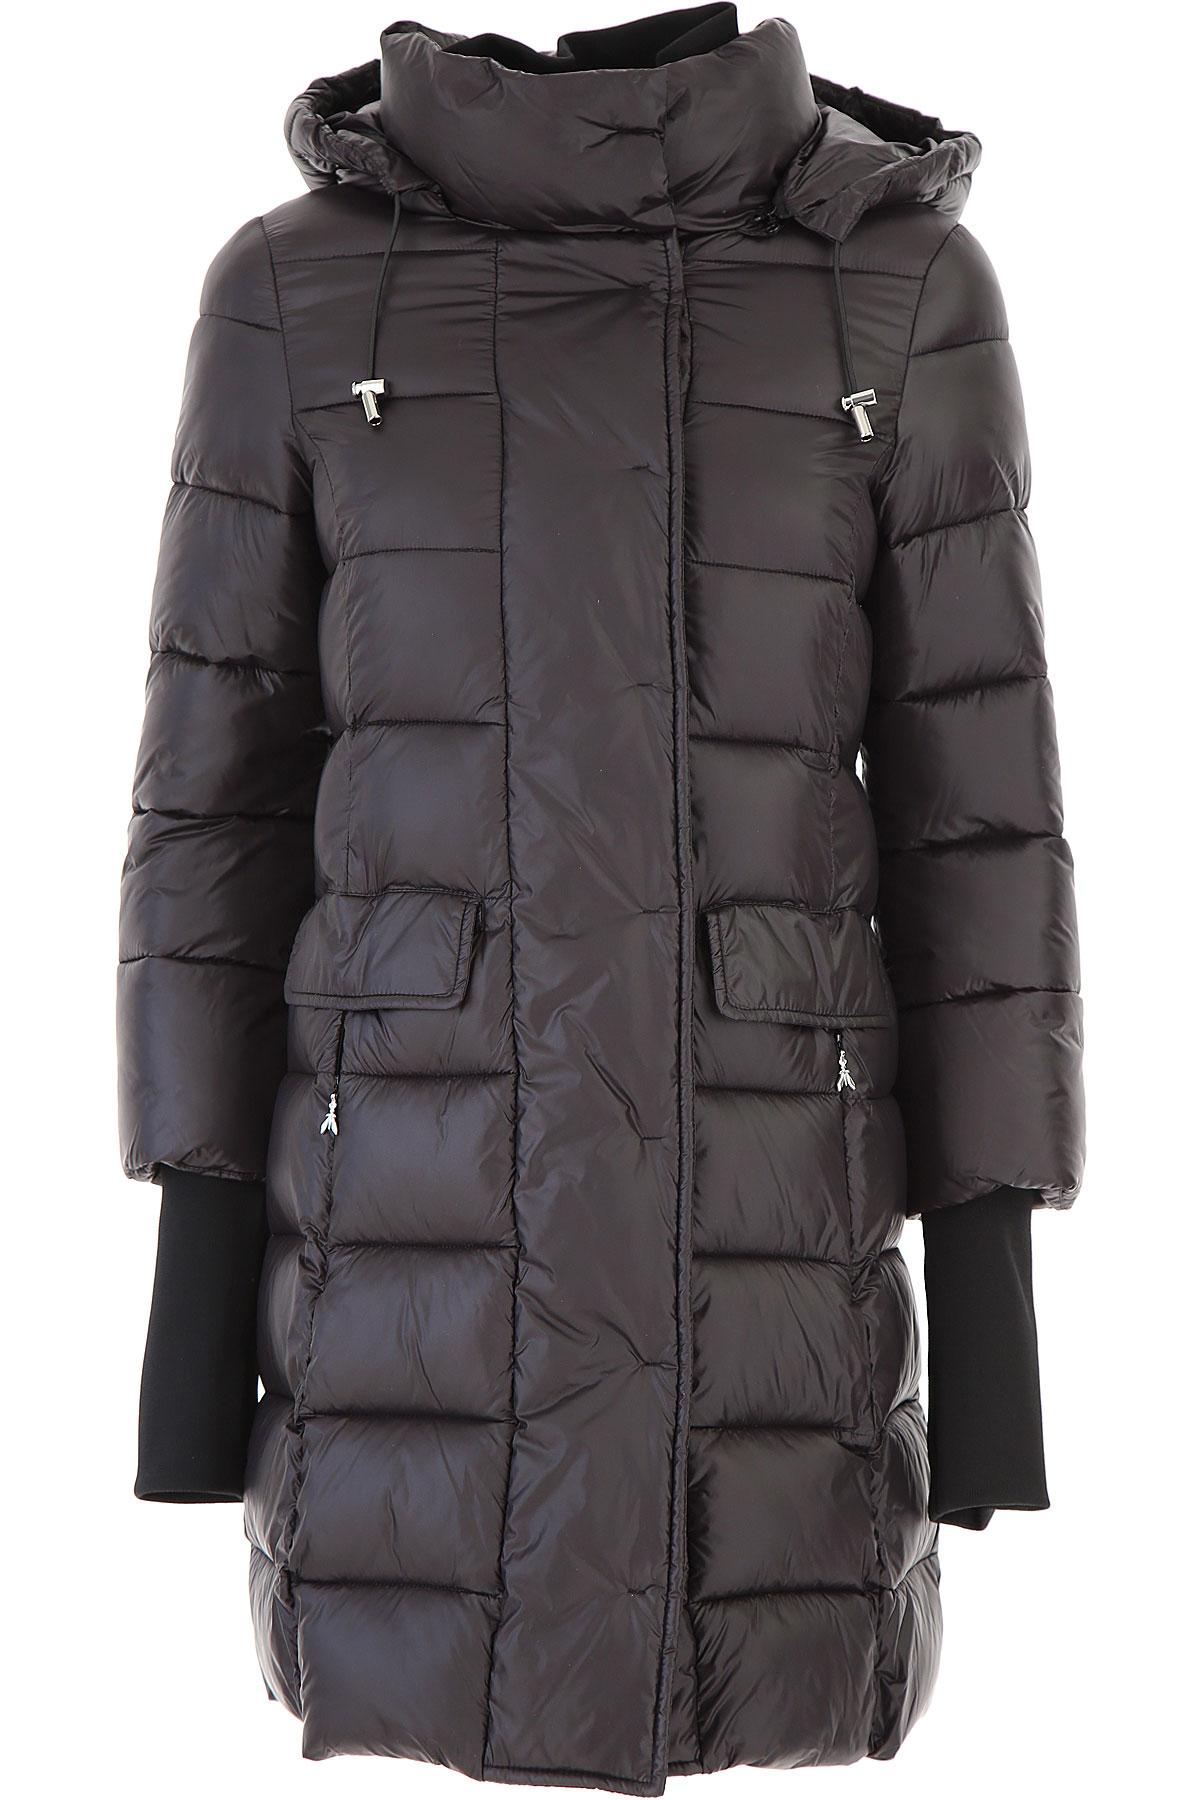 Patrizia Pepe Jacket for Women On Sale, Black, polyamide, 2019, 10 6 8